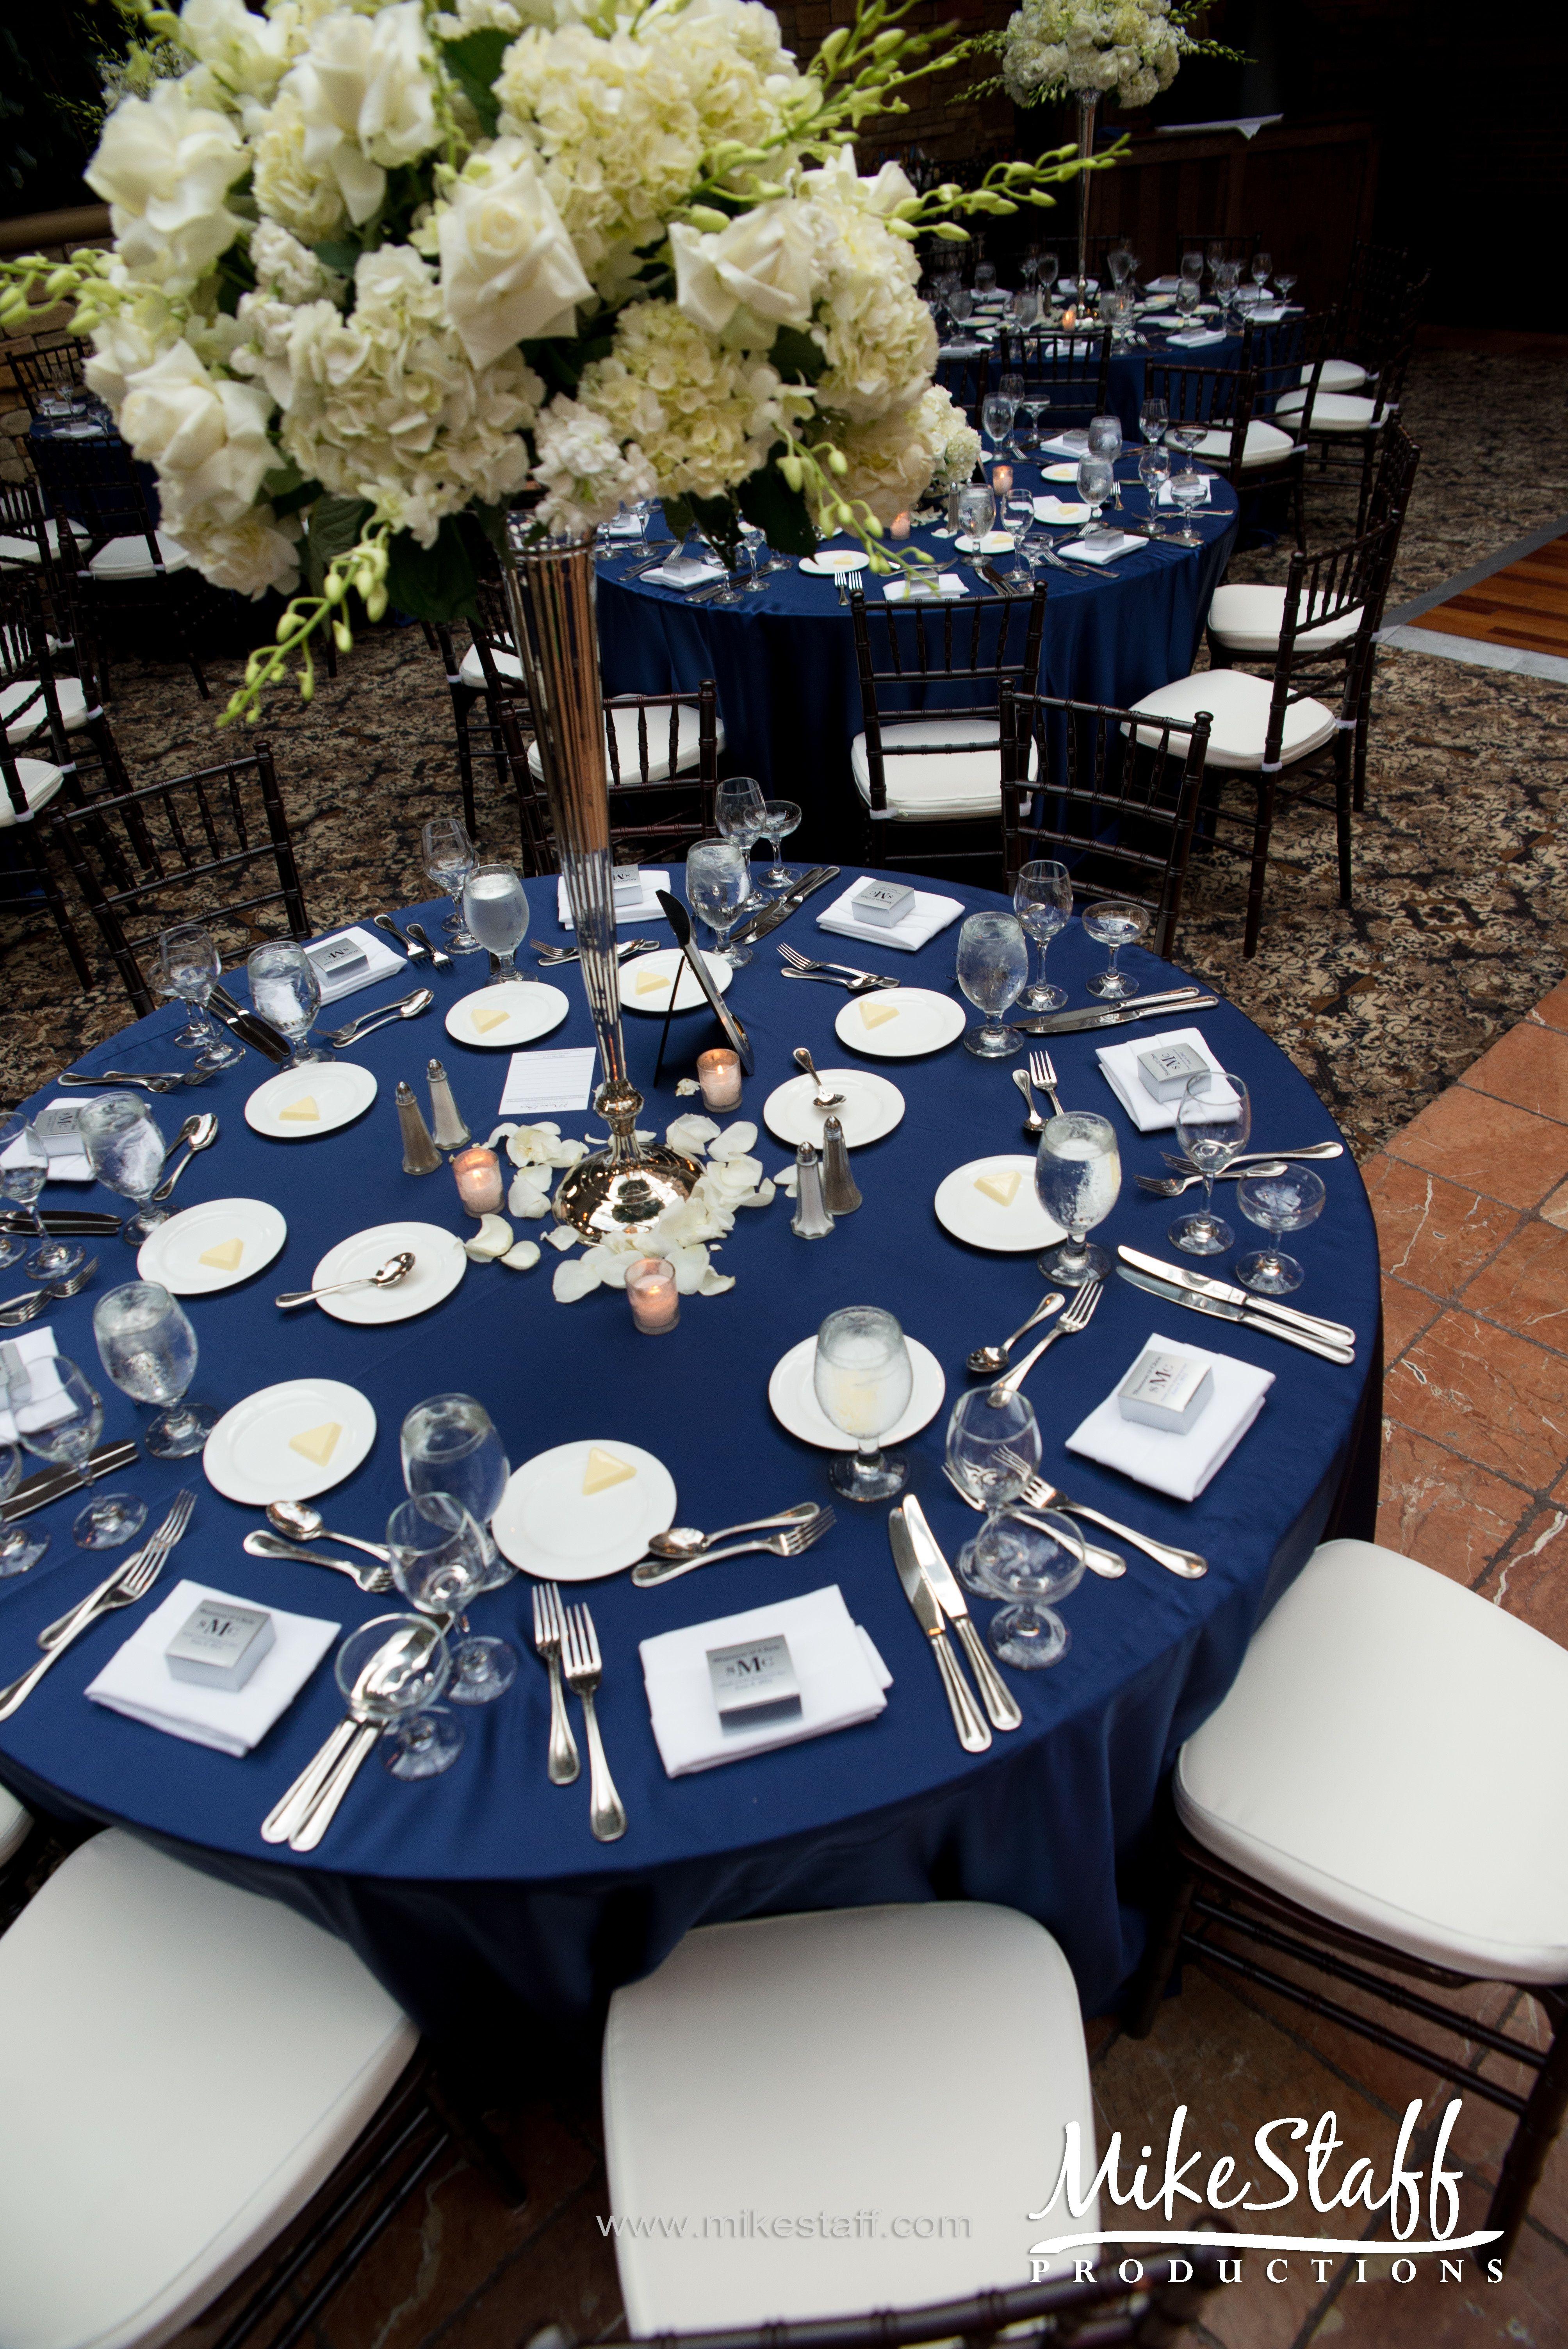 Wedding DJ Services | Silver wedding decorations, Wedding ...